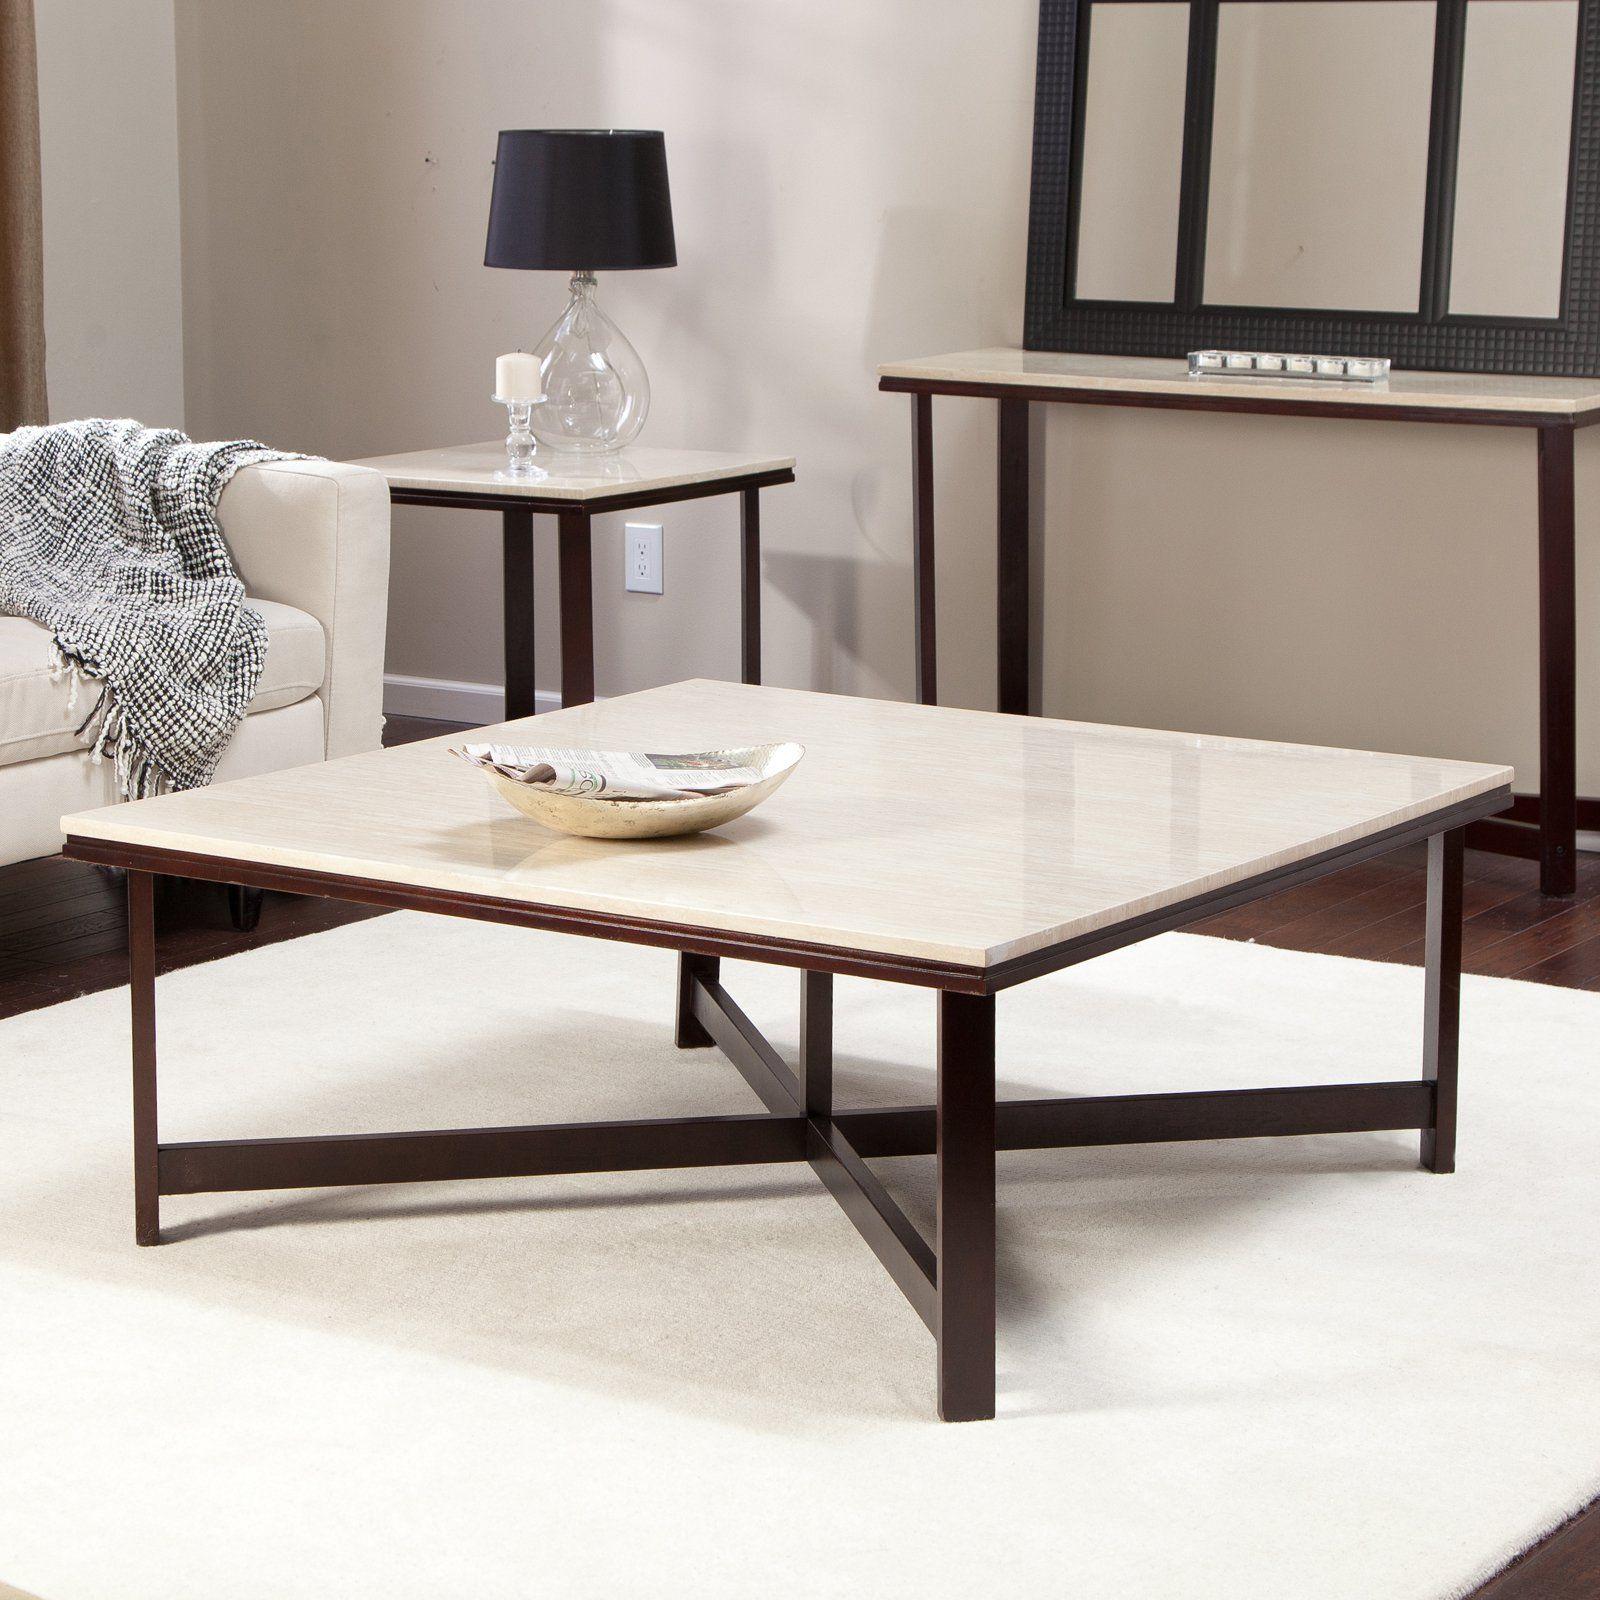 Avorio faux travertine square coffee table hayneedle